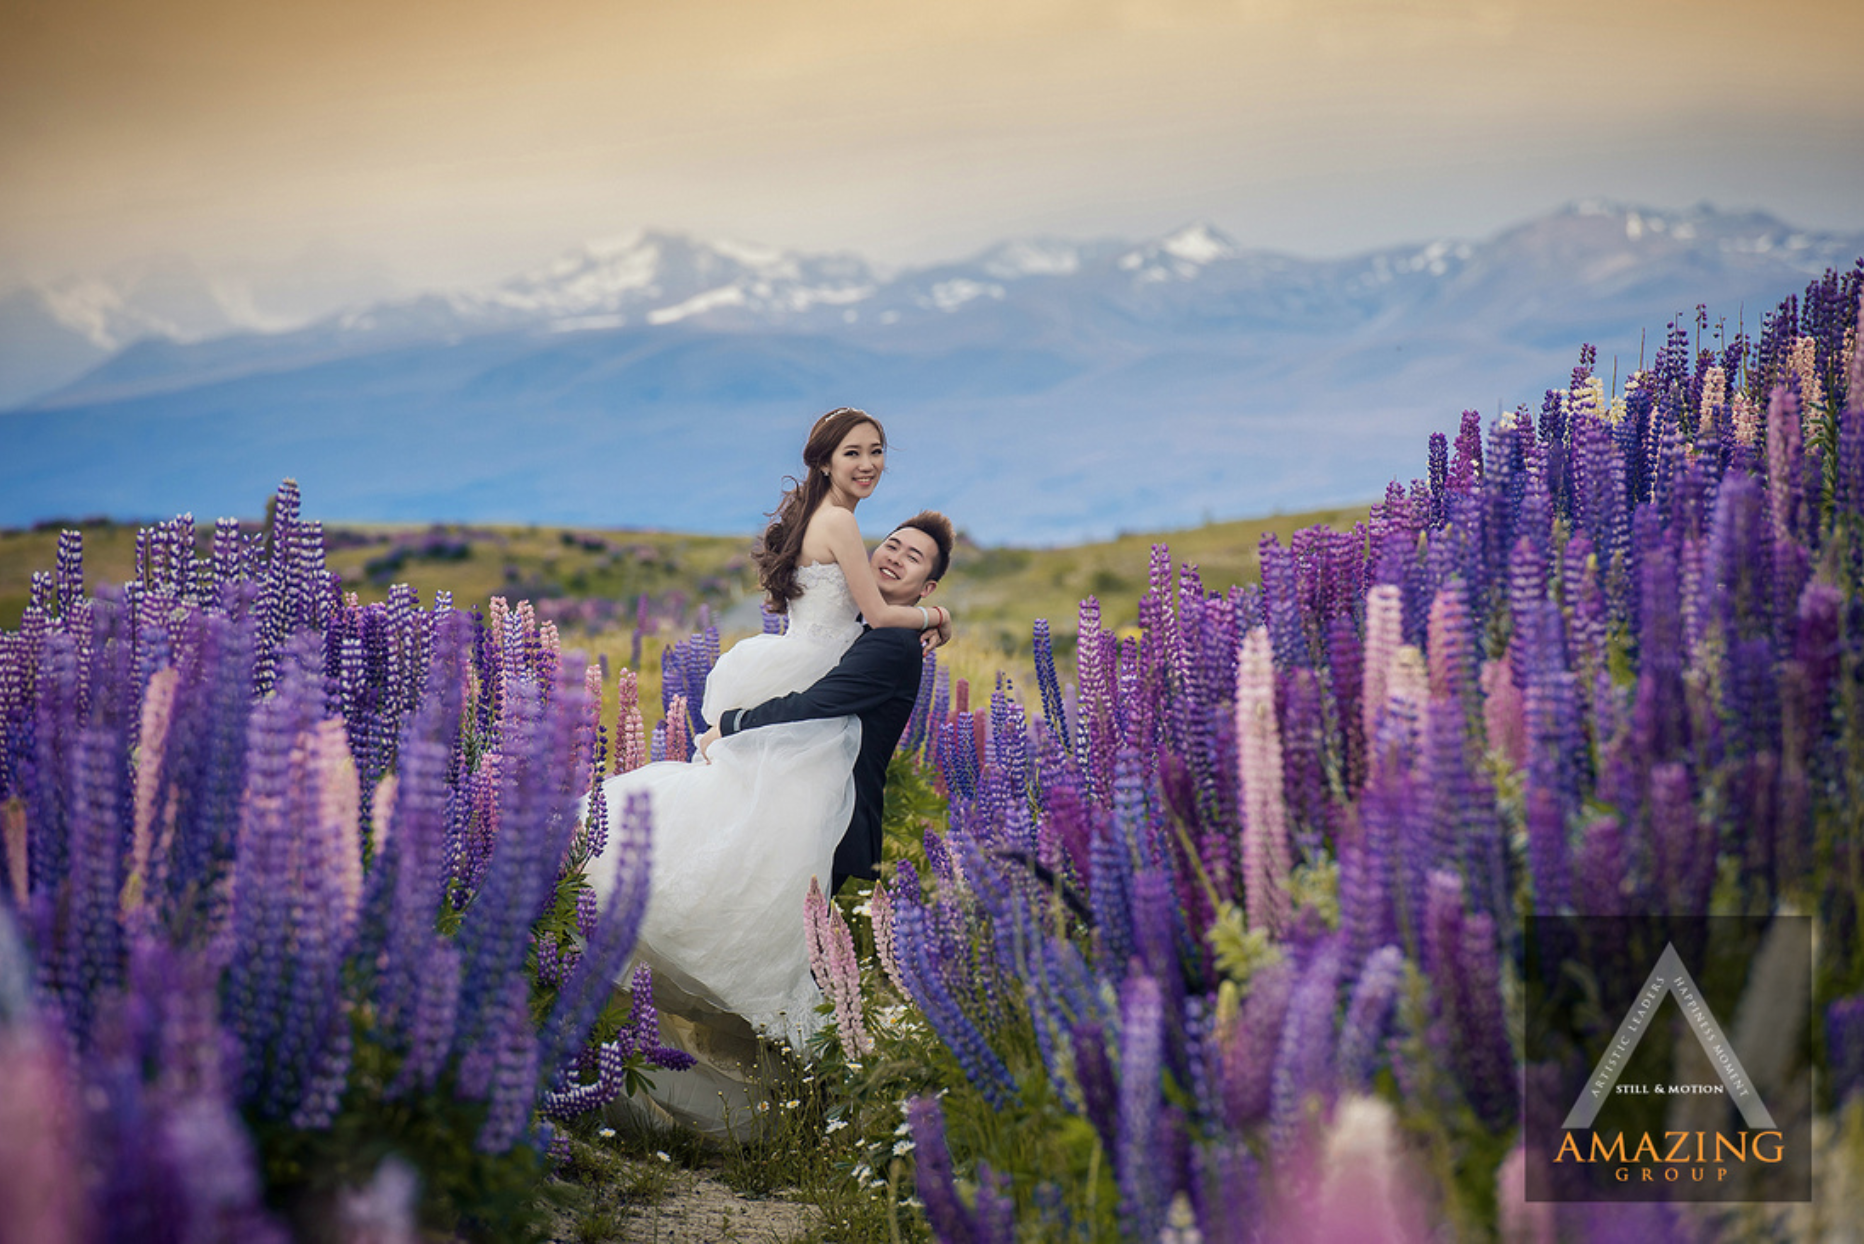 Dream-wedding-photoshoot-venuerific-blog-lupines-field-new-zealand